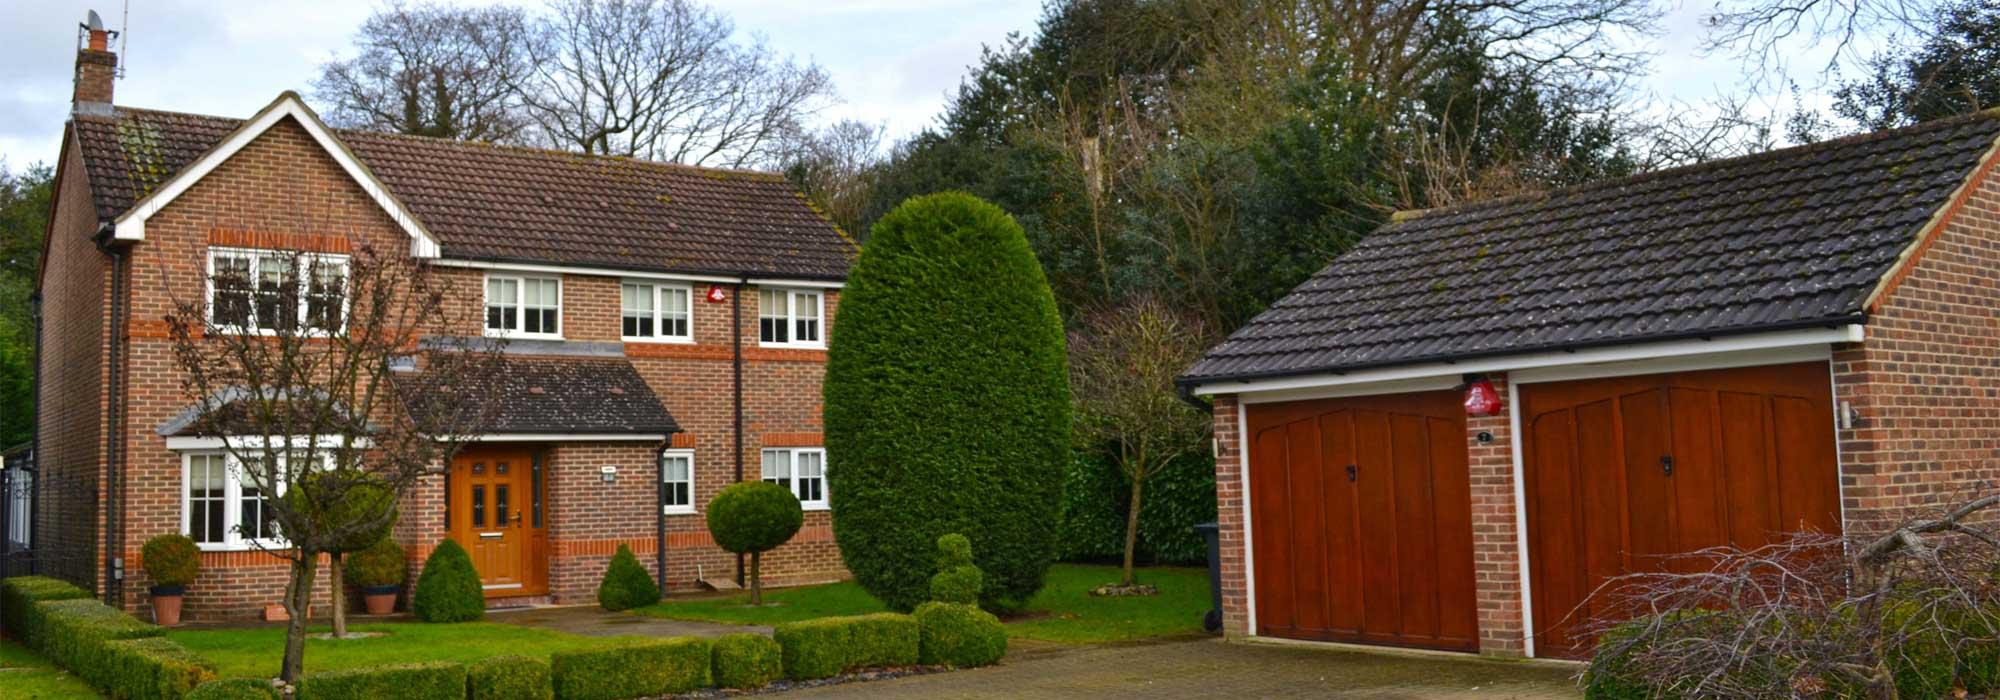 Crabtree Walk, Broxbourne, Hertfordshire, EN10 7NH